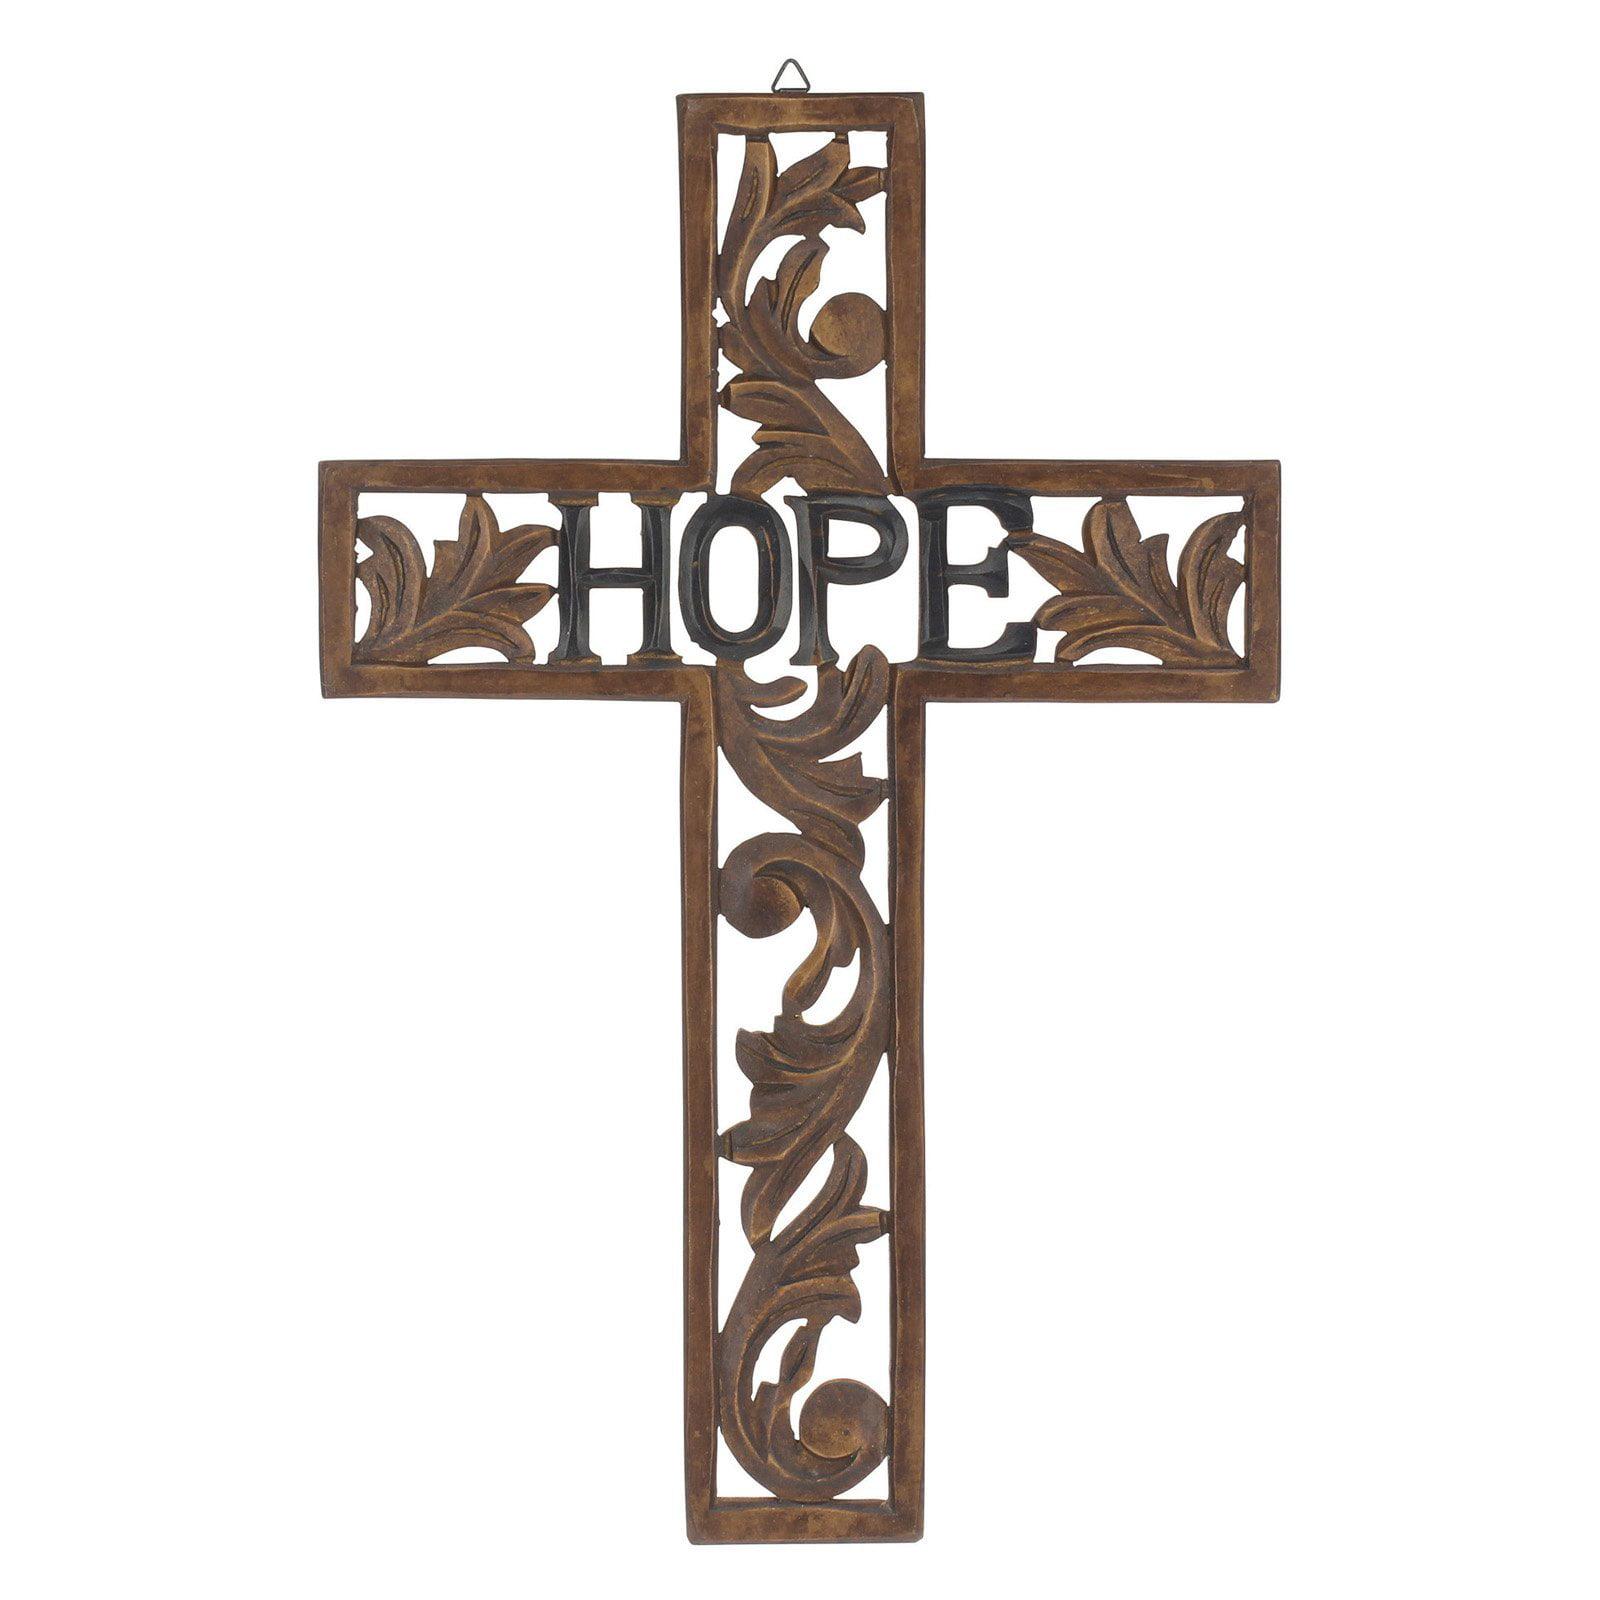 CKK Home Decor Natural Wood Hope Wall Cross Sculpture by